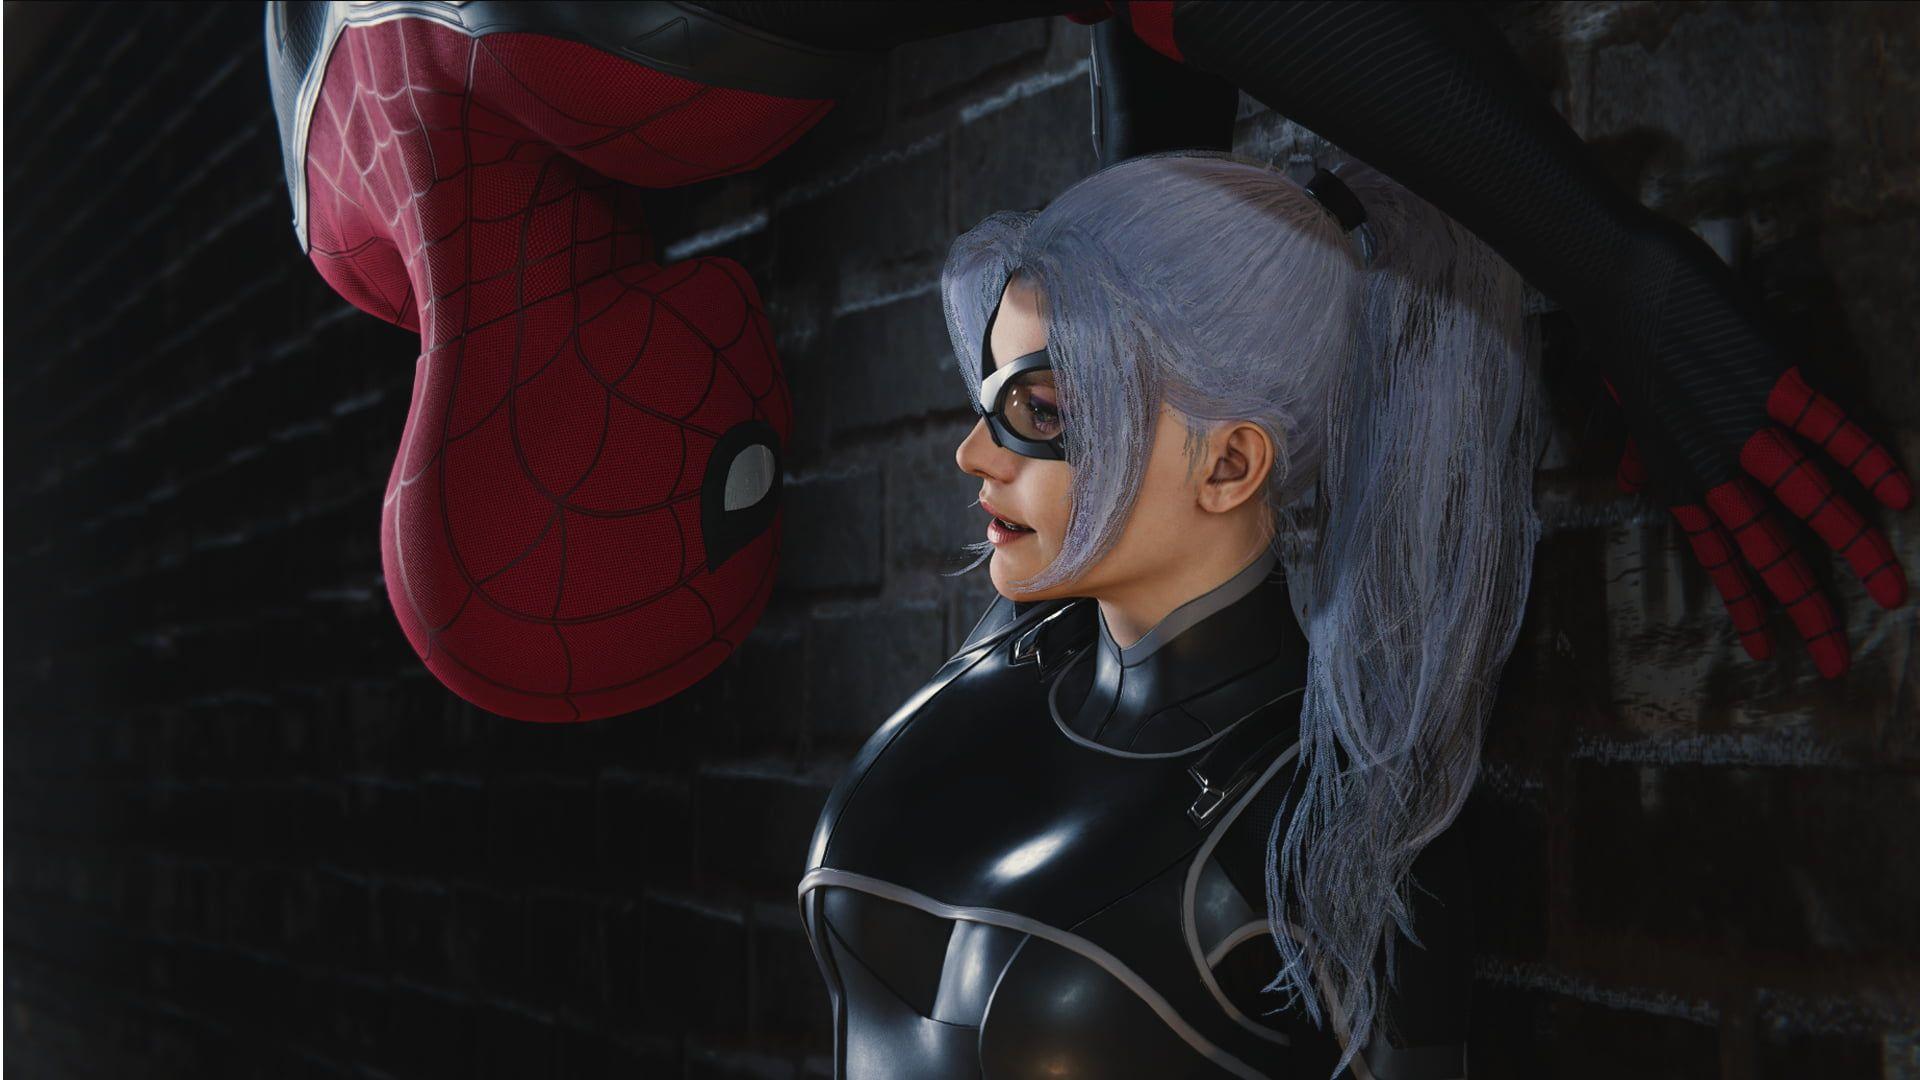 Spider Man Spider Man Ps4 Black Cat Marvel Comics 1080p Wallpaper Hdwallpaper Desktop Black Cat Marvel Comics Black Cat Marvel Spiderman